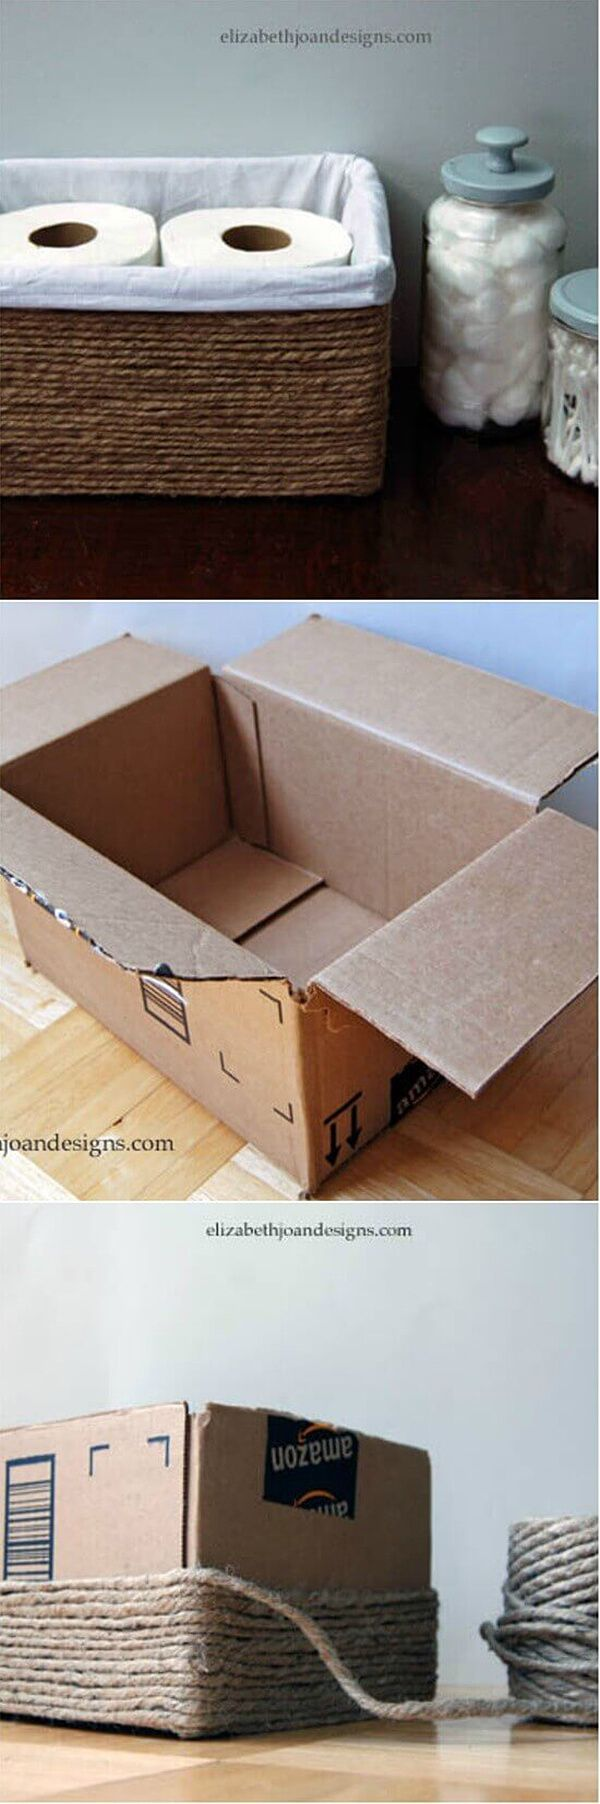 Creative Bathroom Basket from a Simple Box